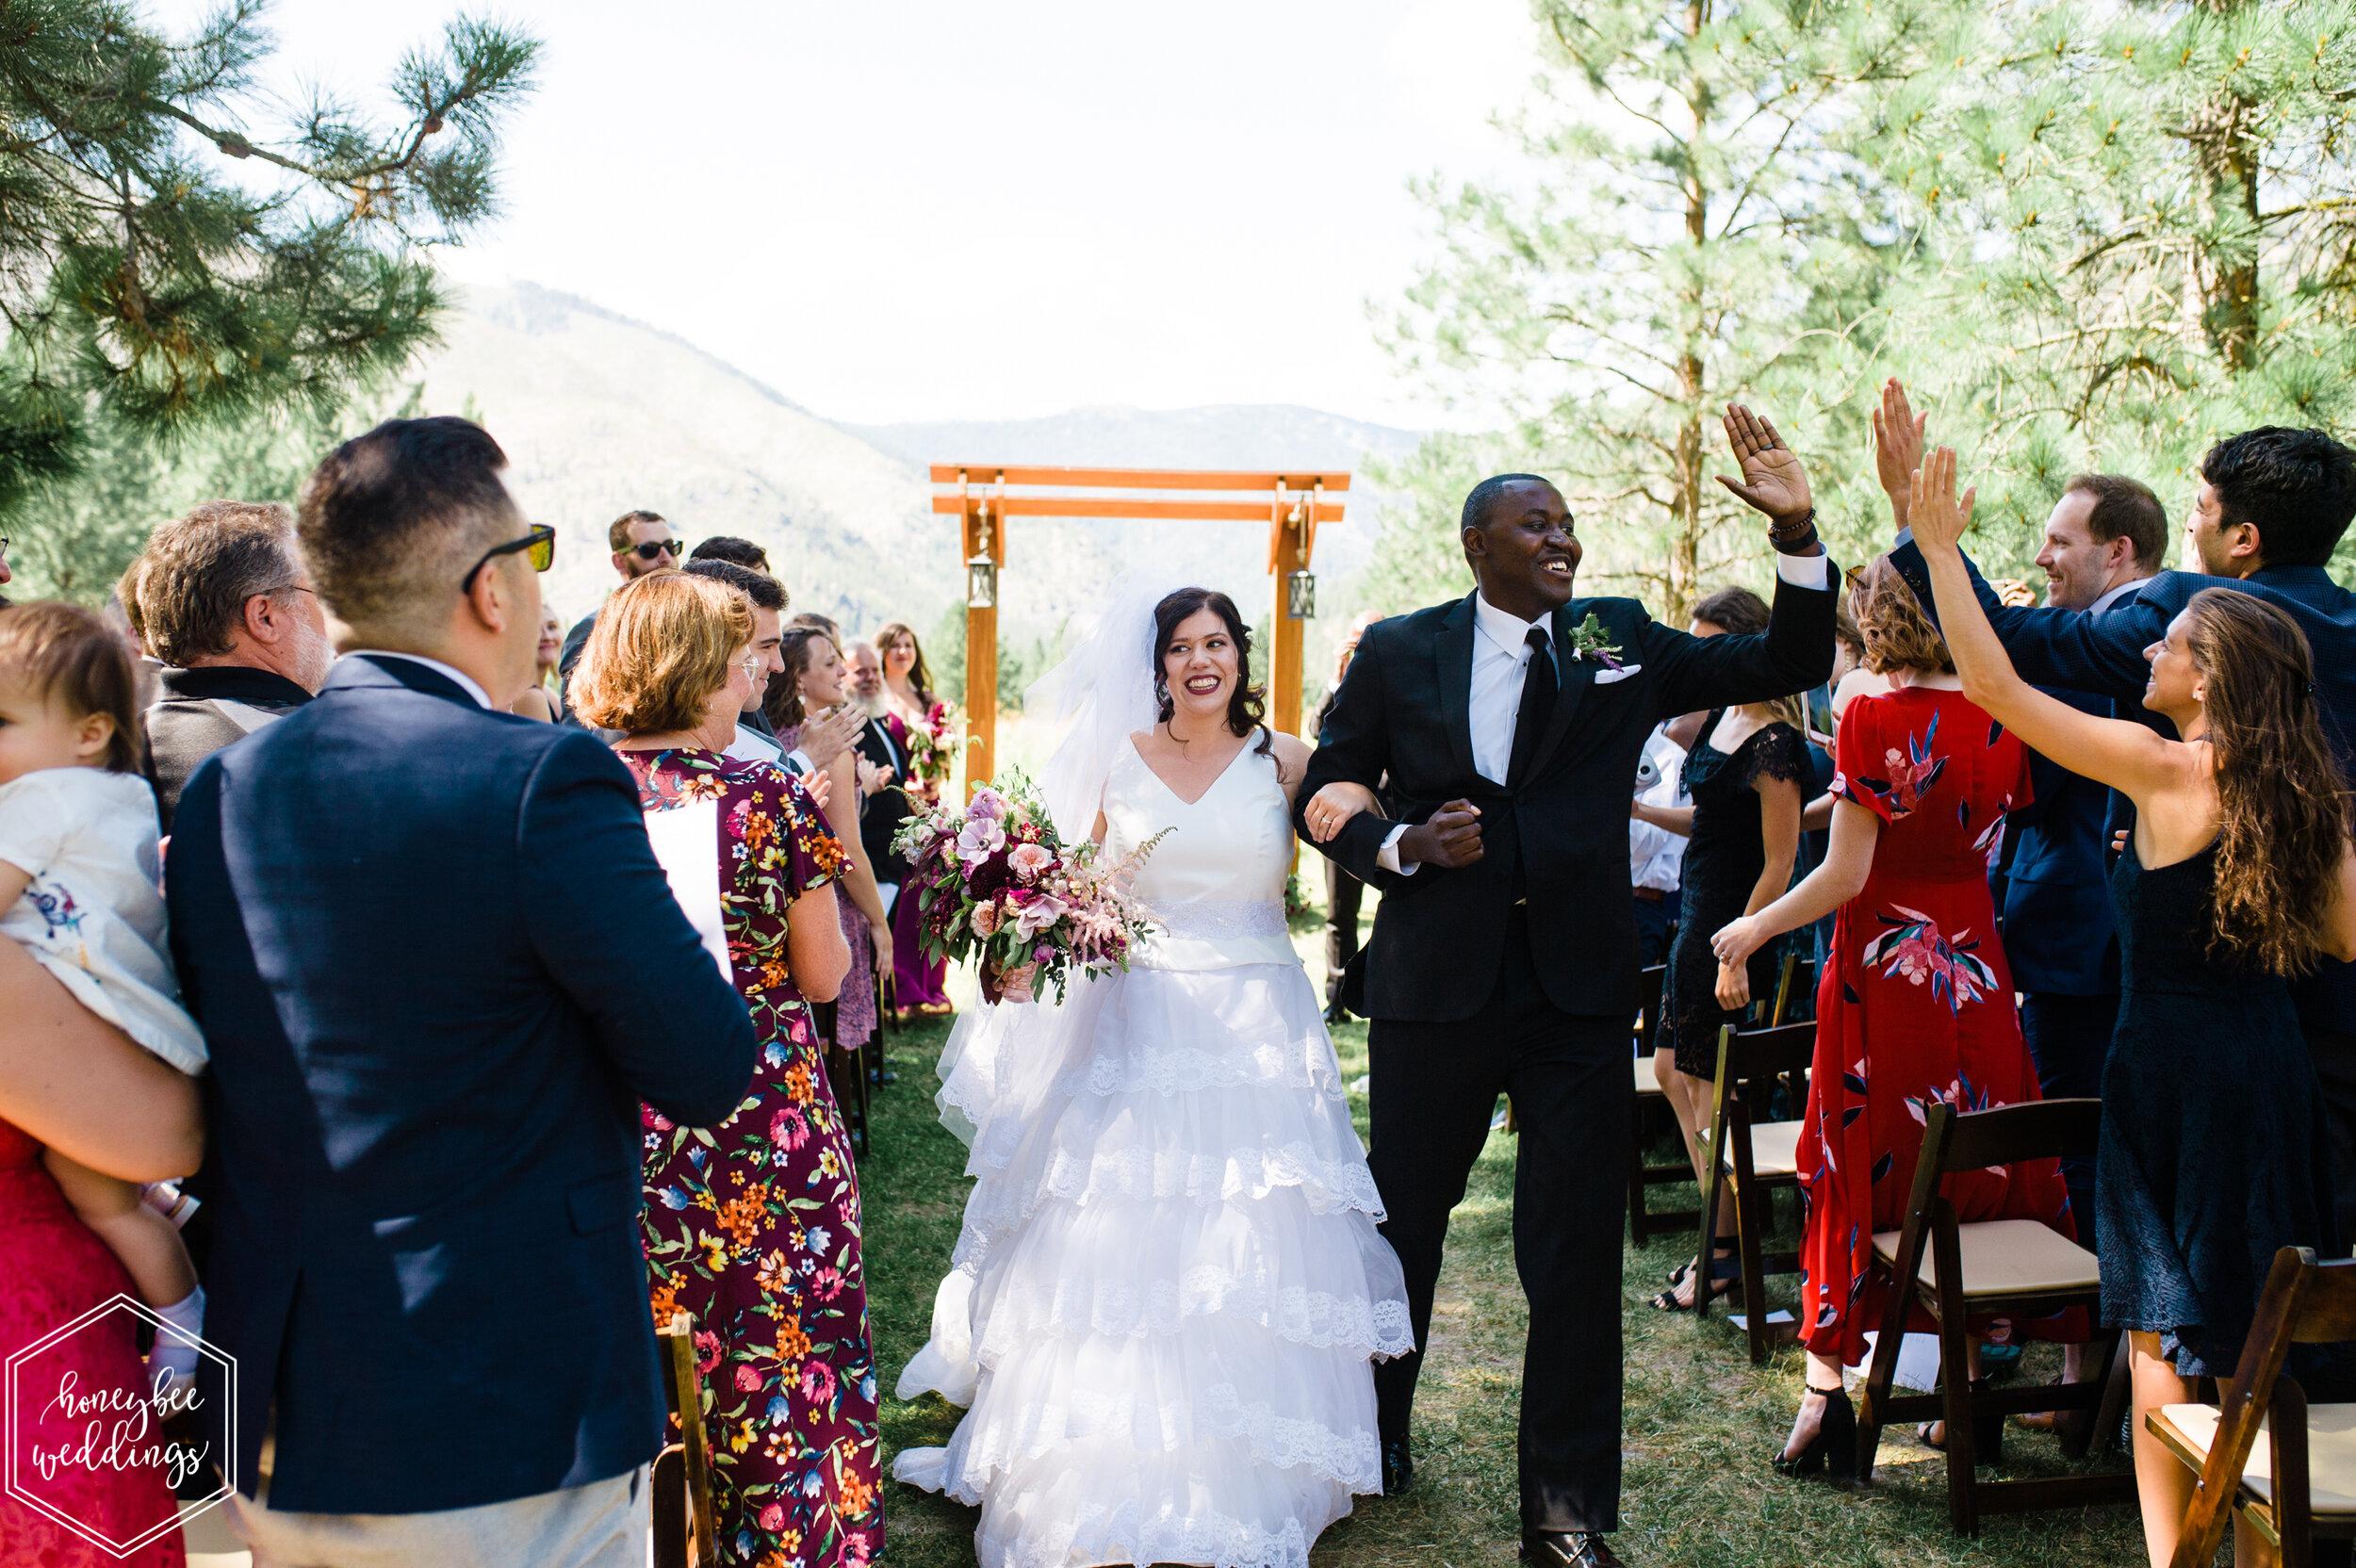 070White Raven Wedding_Montana Wedding Photographer_Rebekah & Likom_Honeybee Weddings_July 27, 2019-1145.jpg